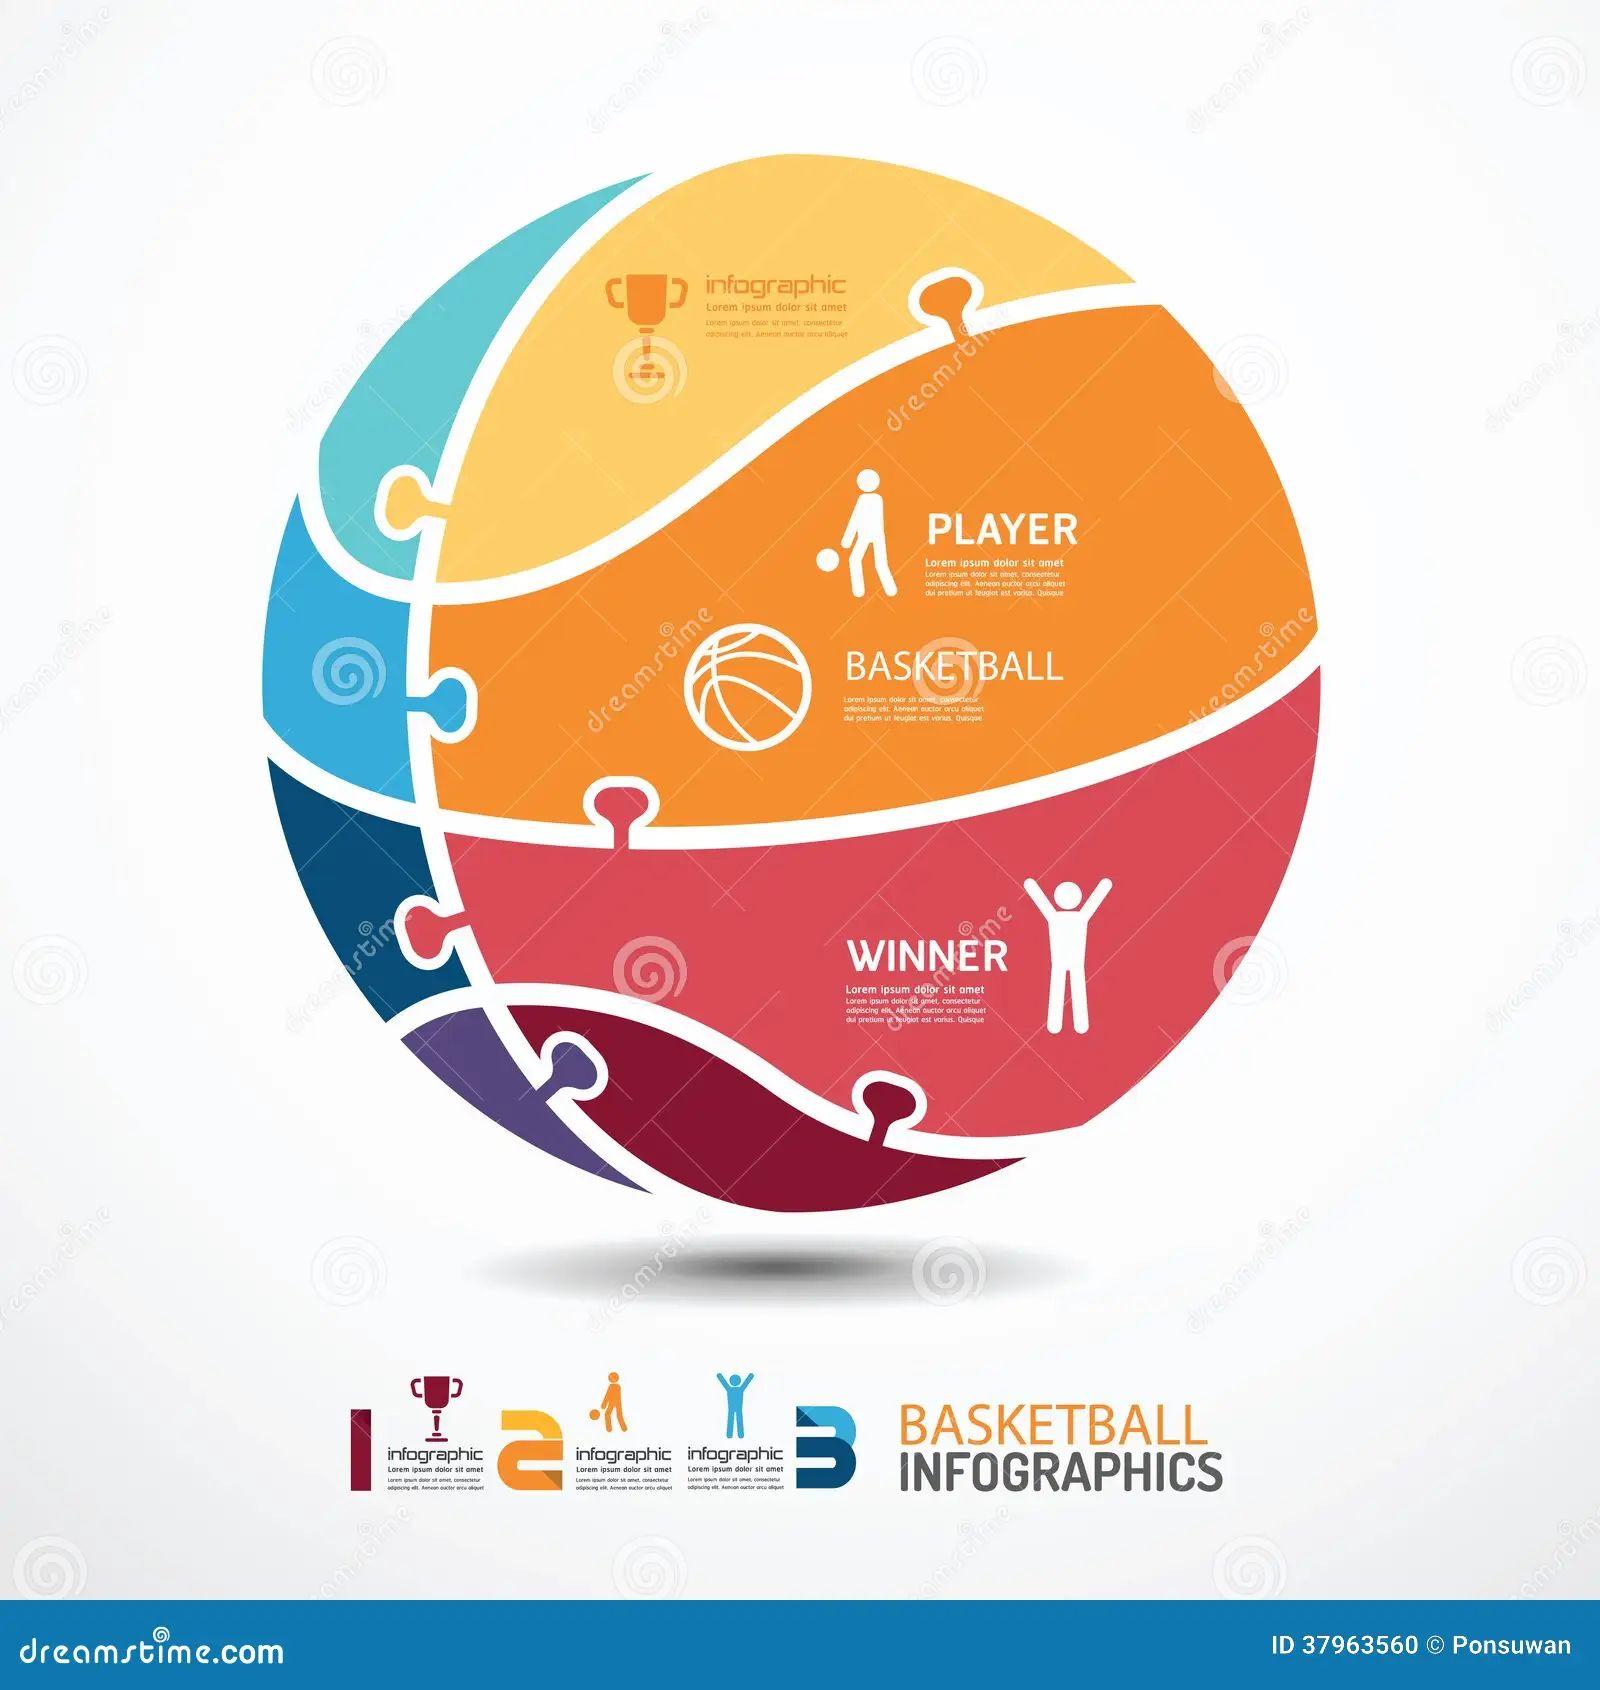 basketball infographic template